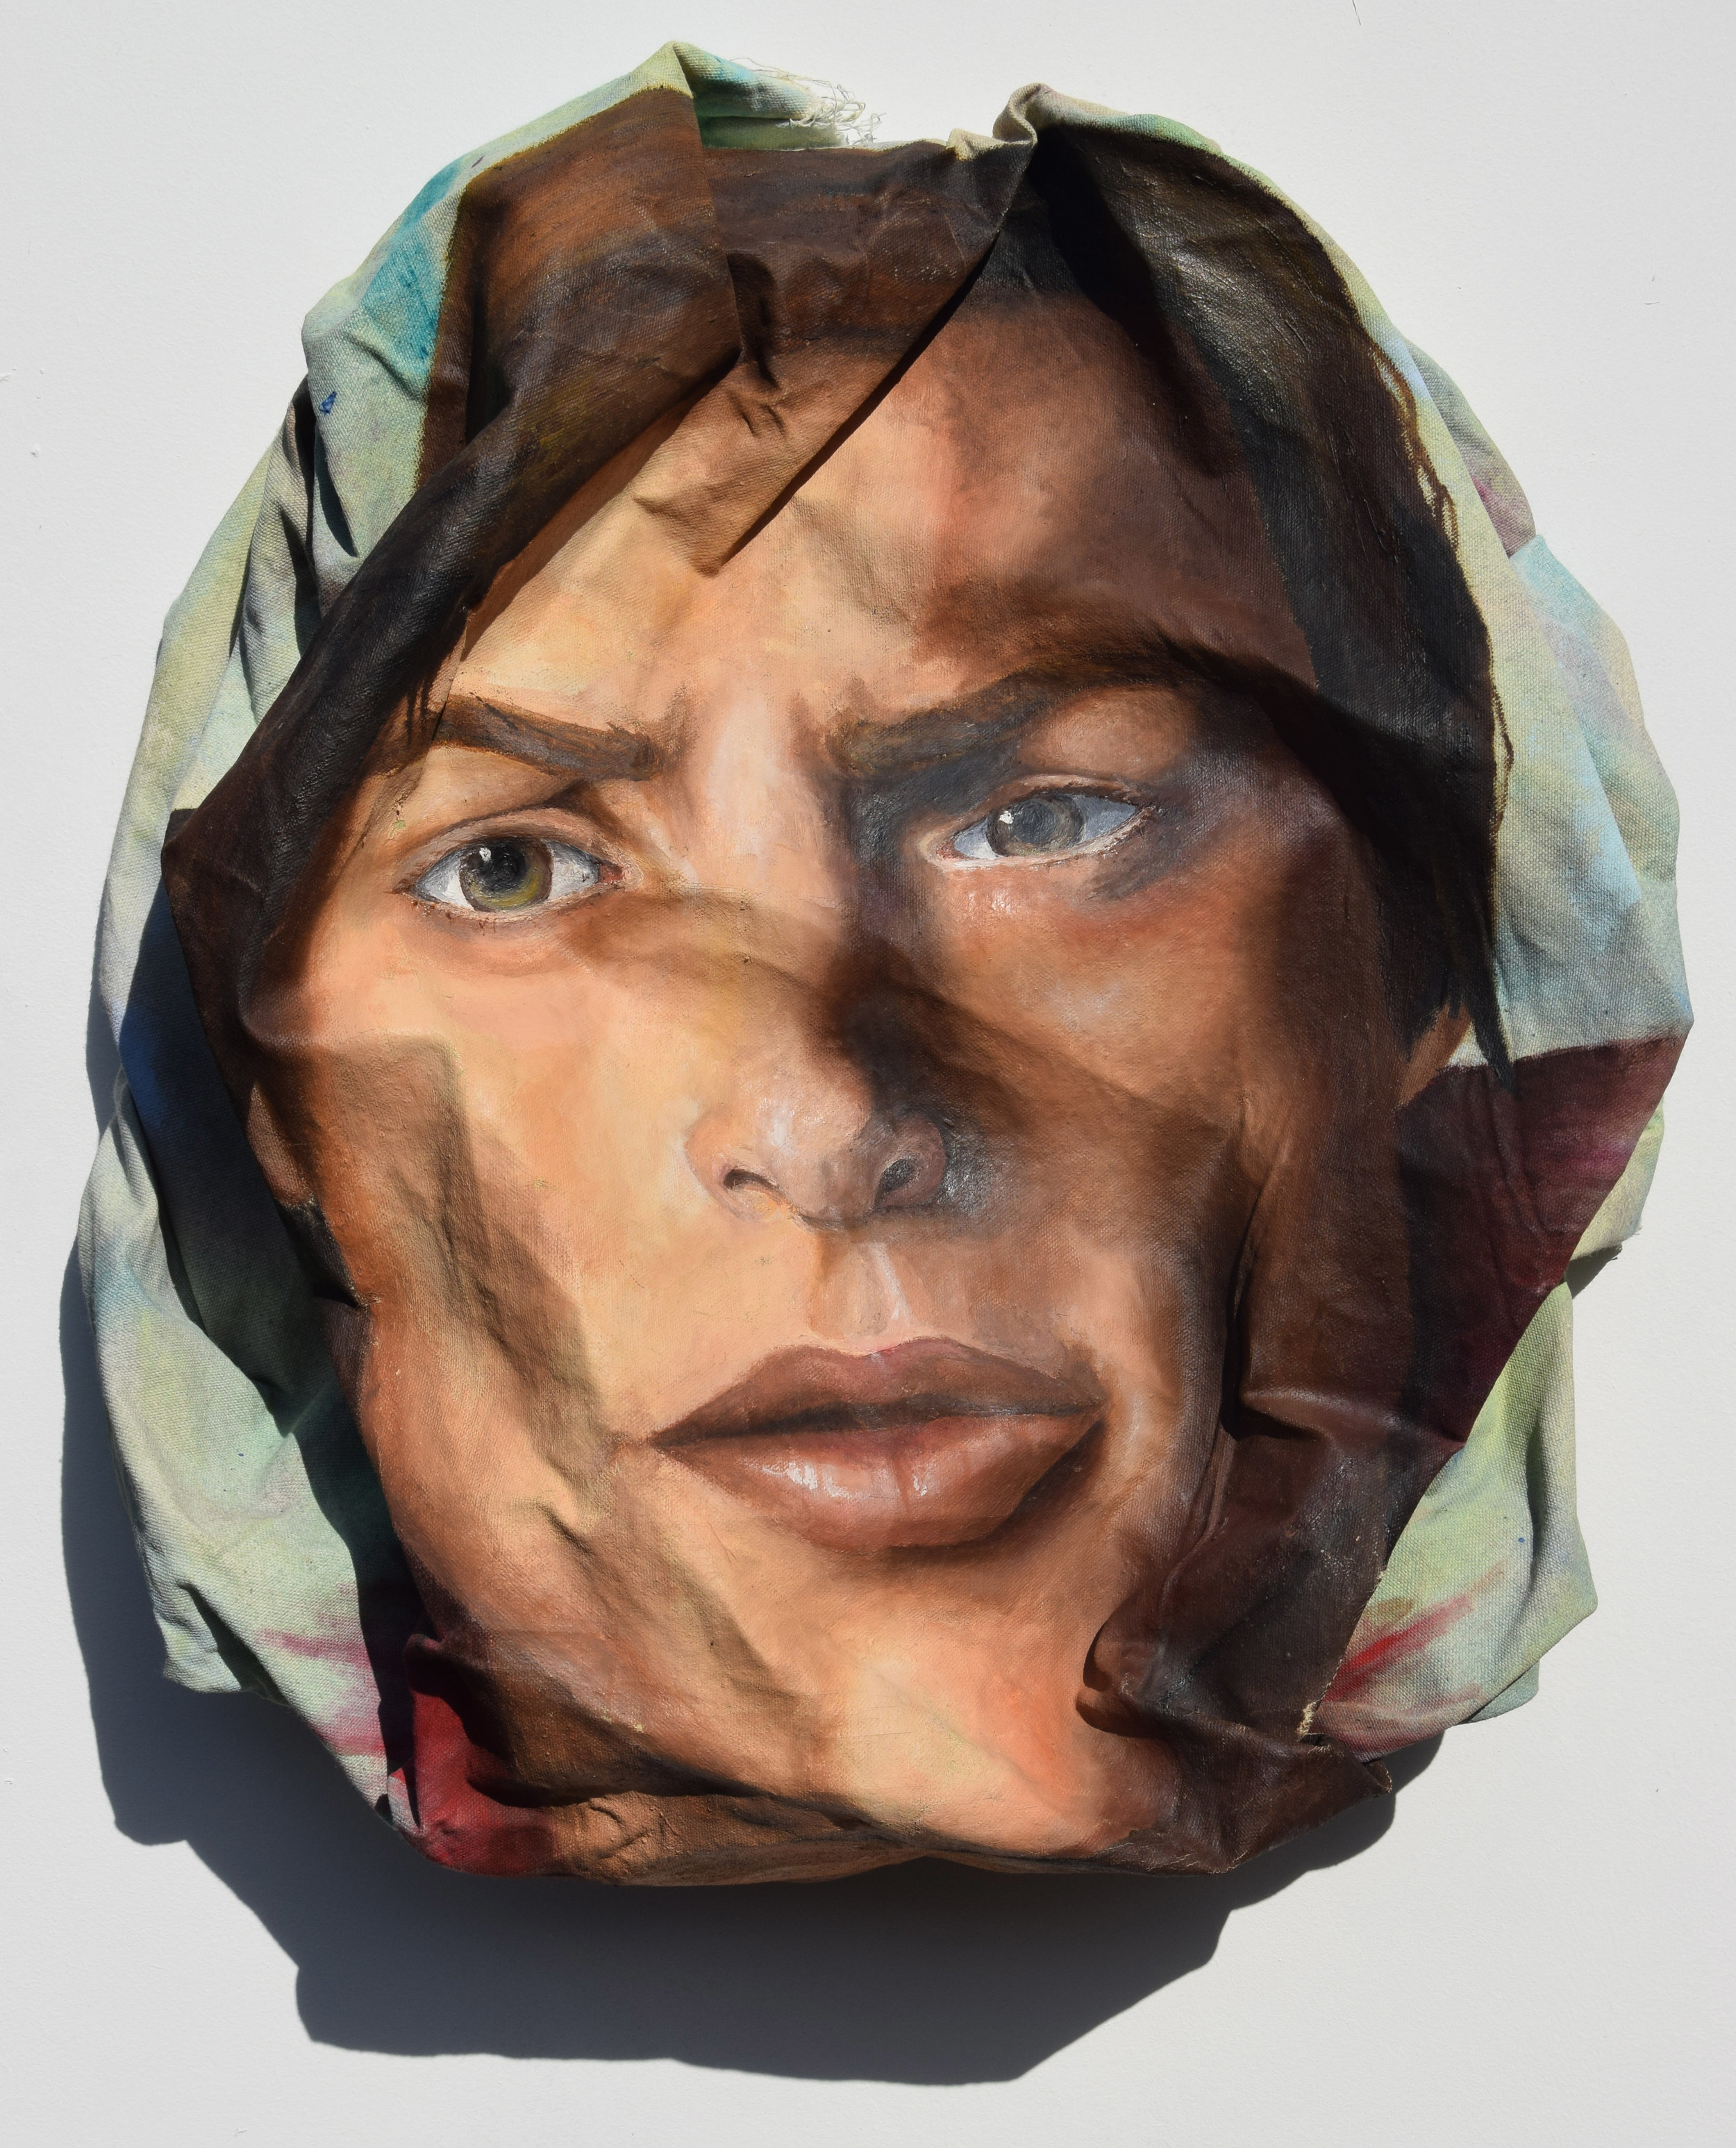 Unmasked man,2015  Oil on canvas   54 x 54 cm  £600